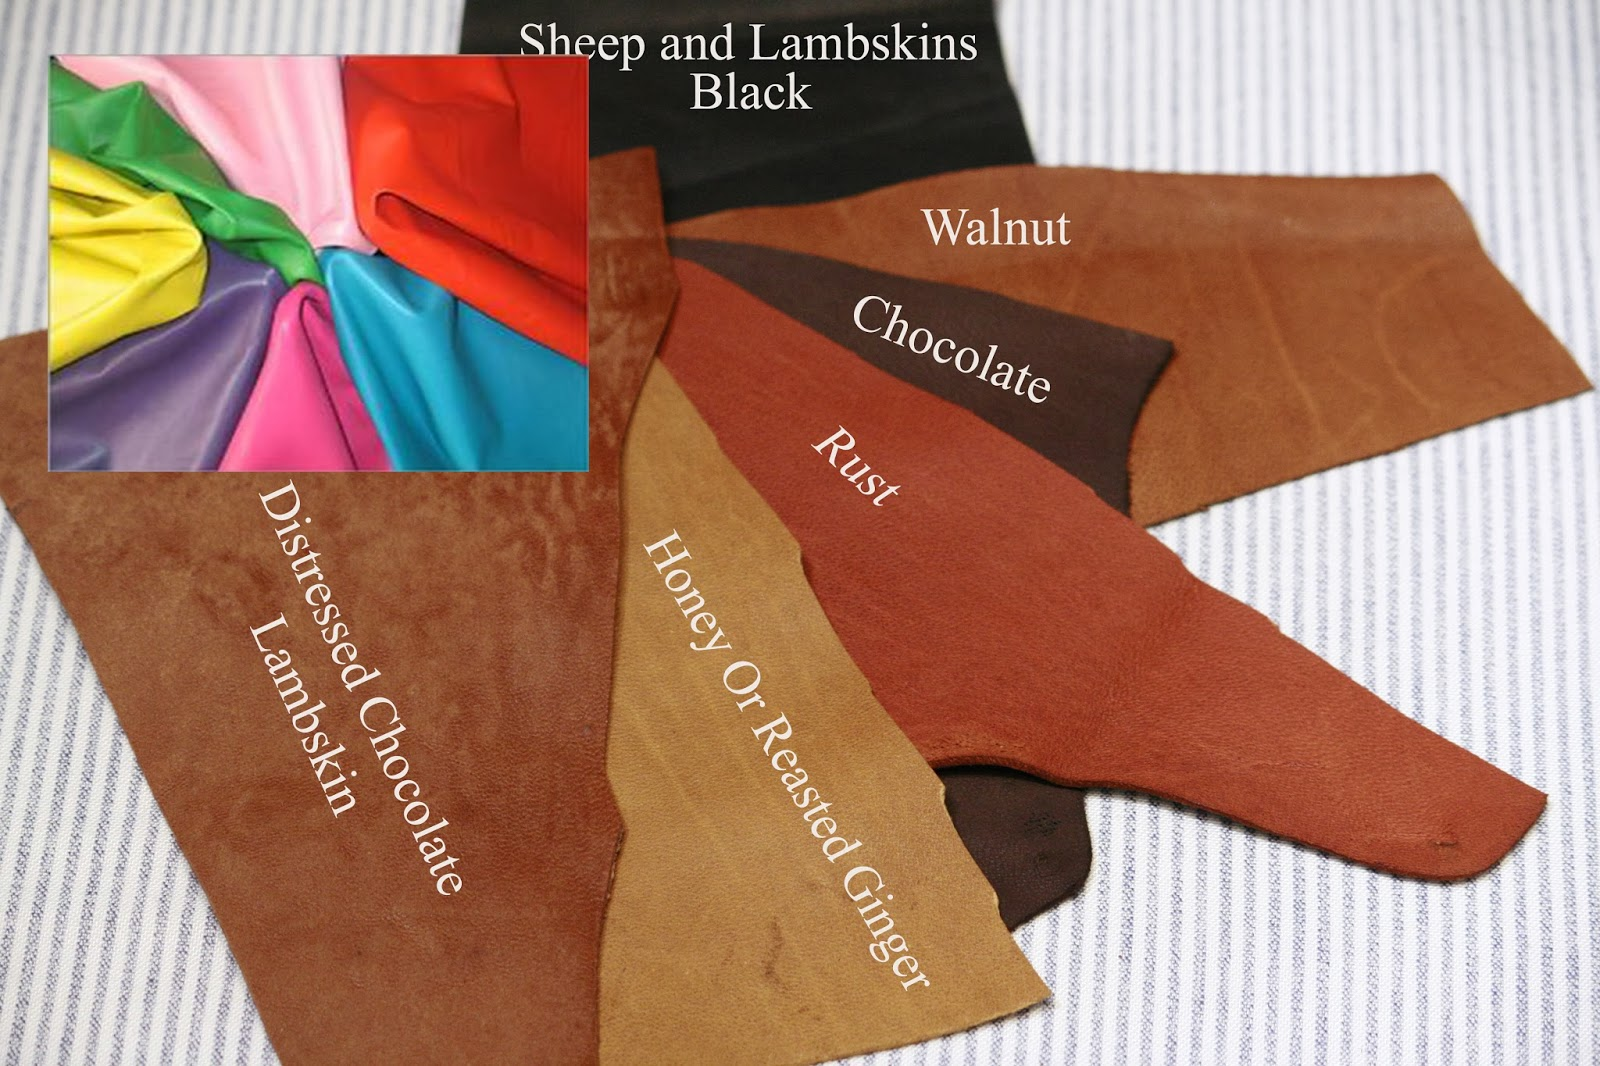 phân biệt các loại da cơ bản, Phân biệt các loại da cơ bản: da trâu, da bò, da cừu, da dê, da lợn